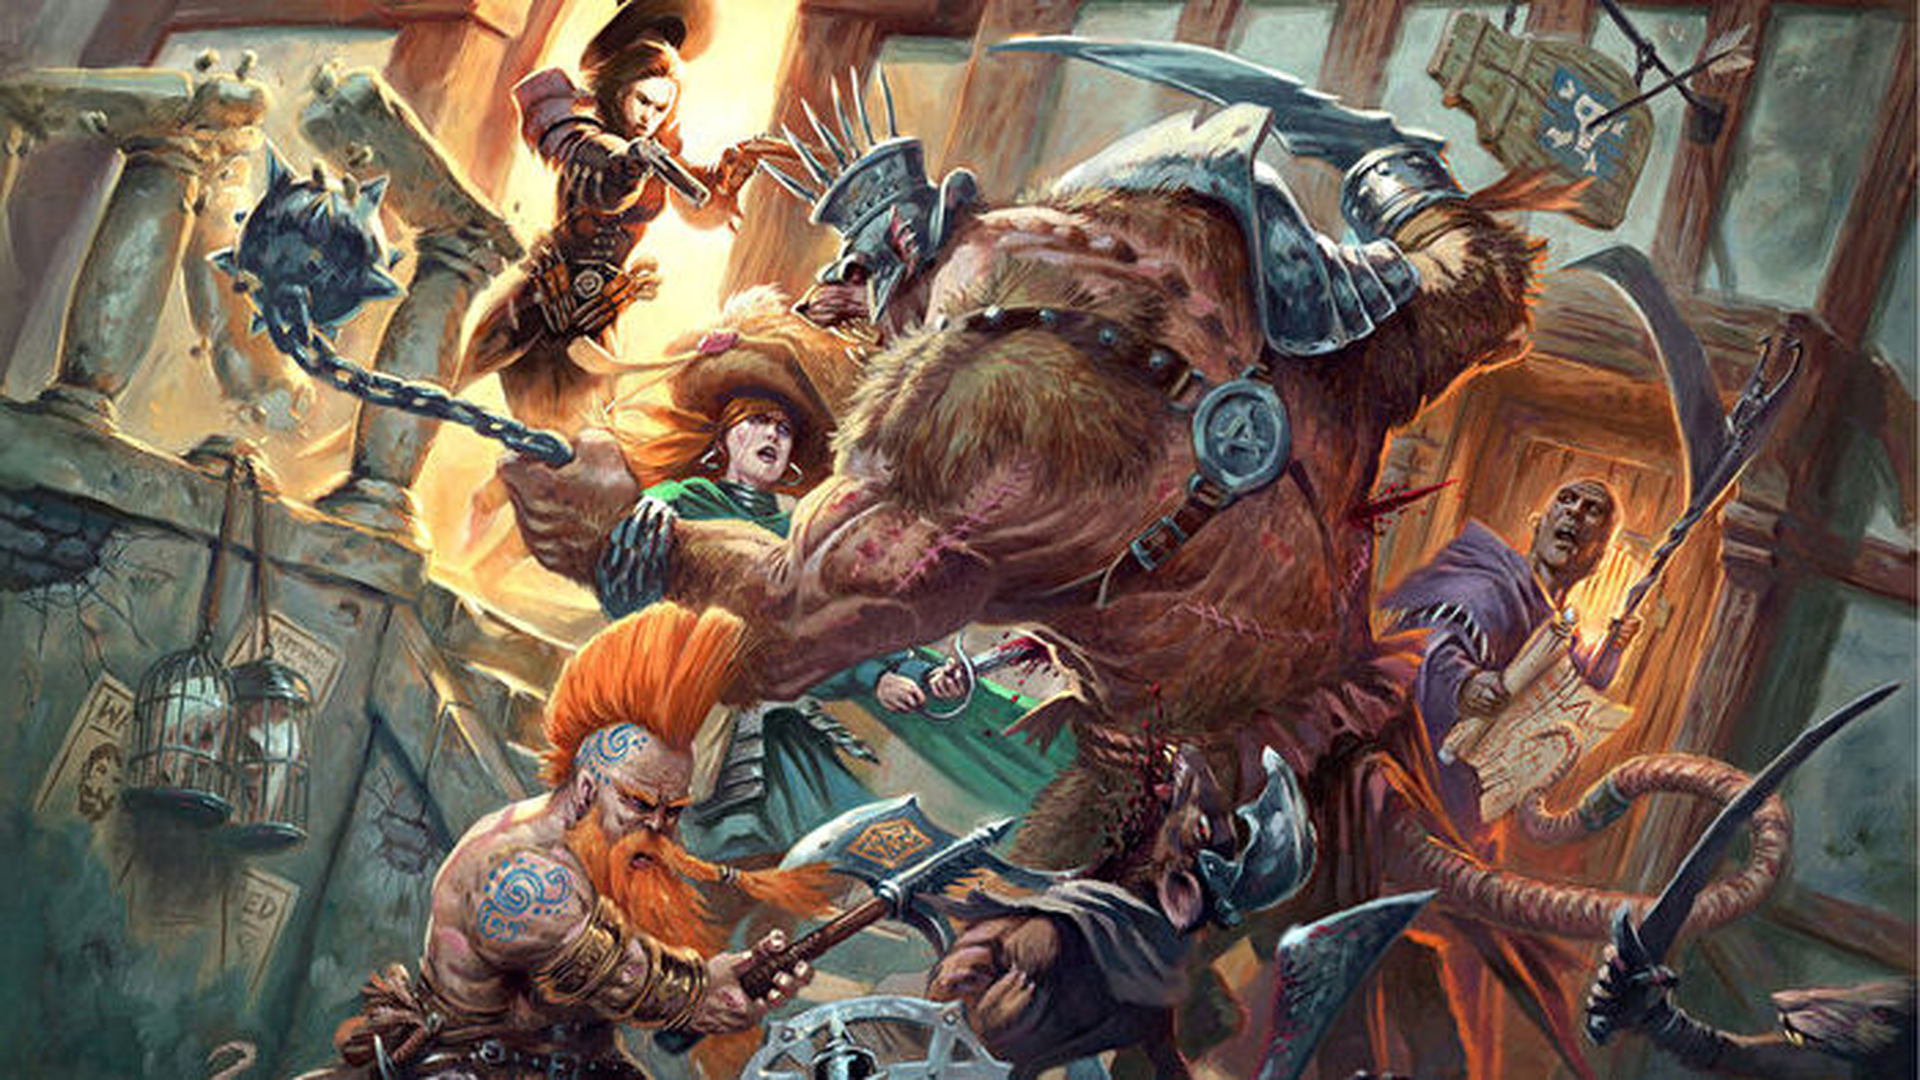 Warhammer Fantasy Roleplay RPG 4E core rulebook artwork